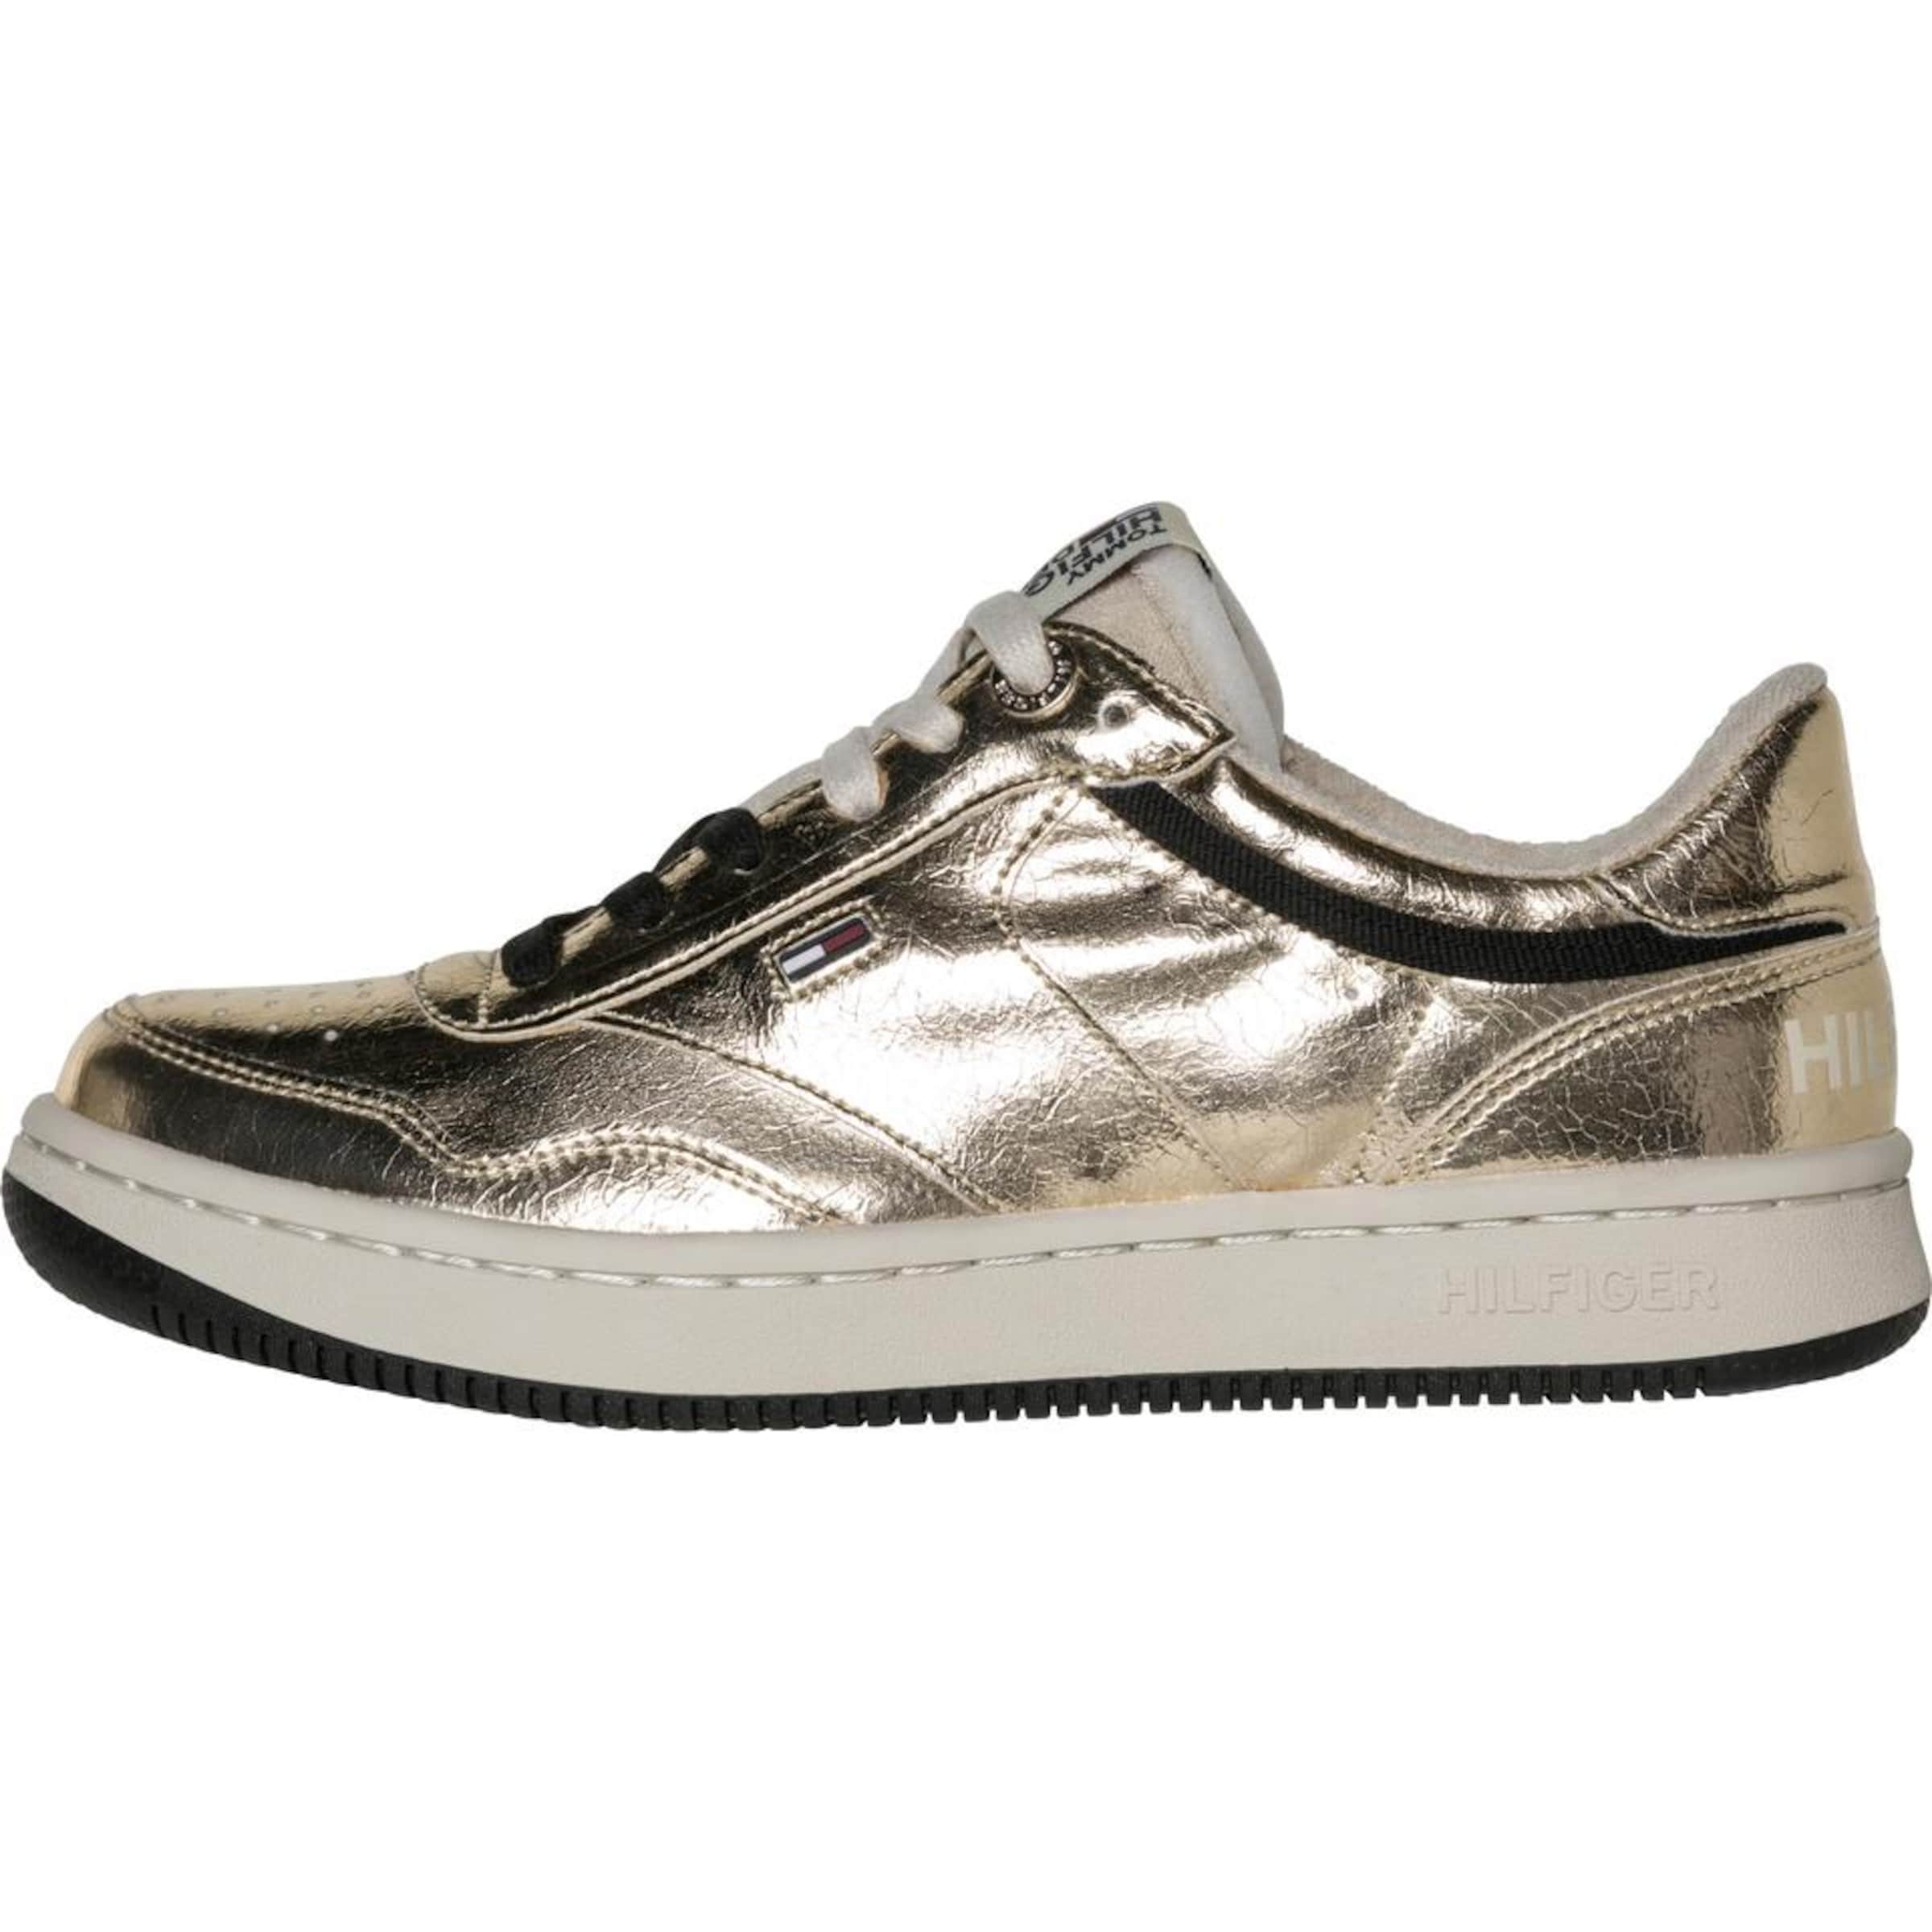 TOMMY HILFIGER Sneaker WMNS J1385UMP 1Z1